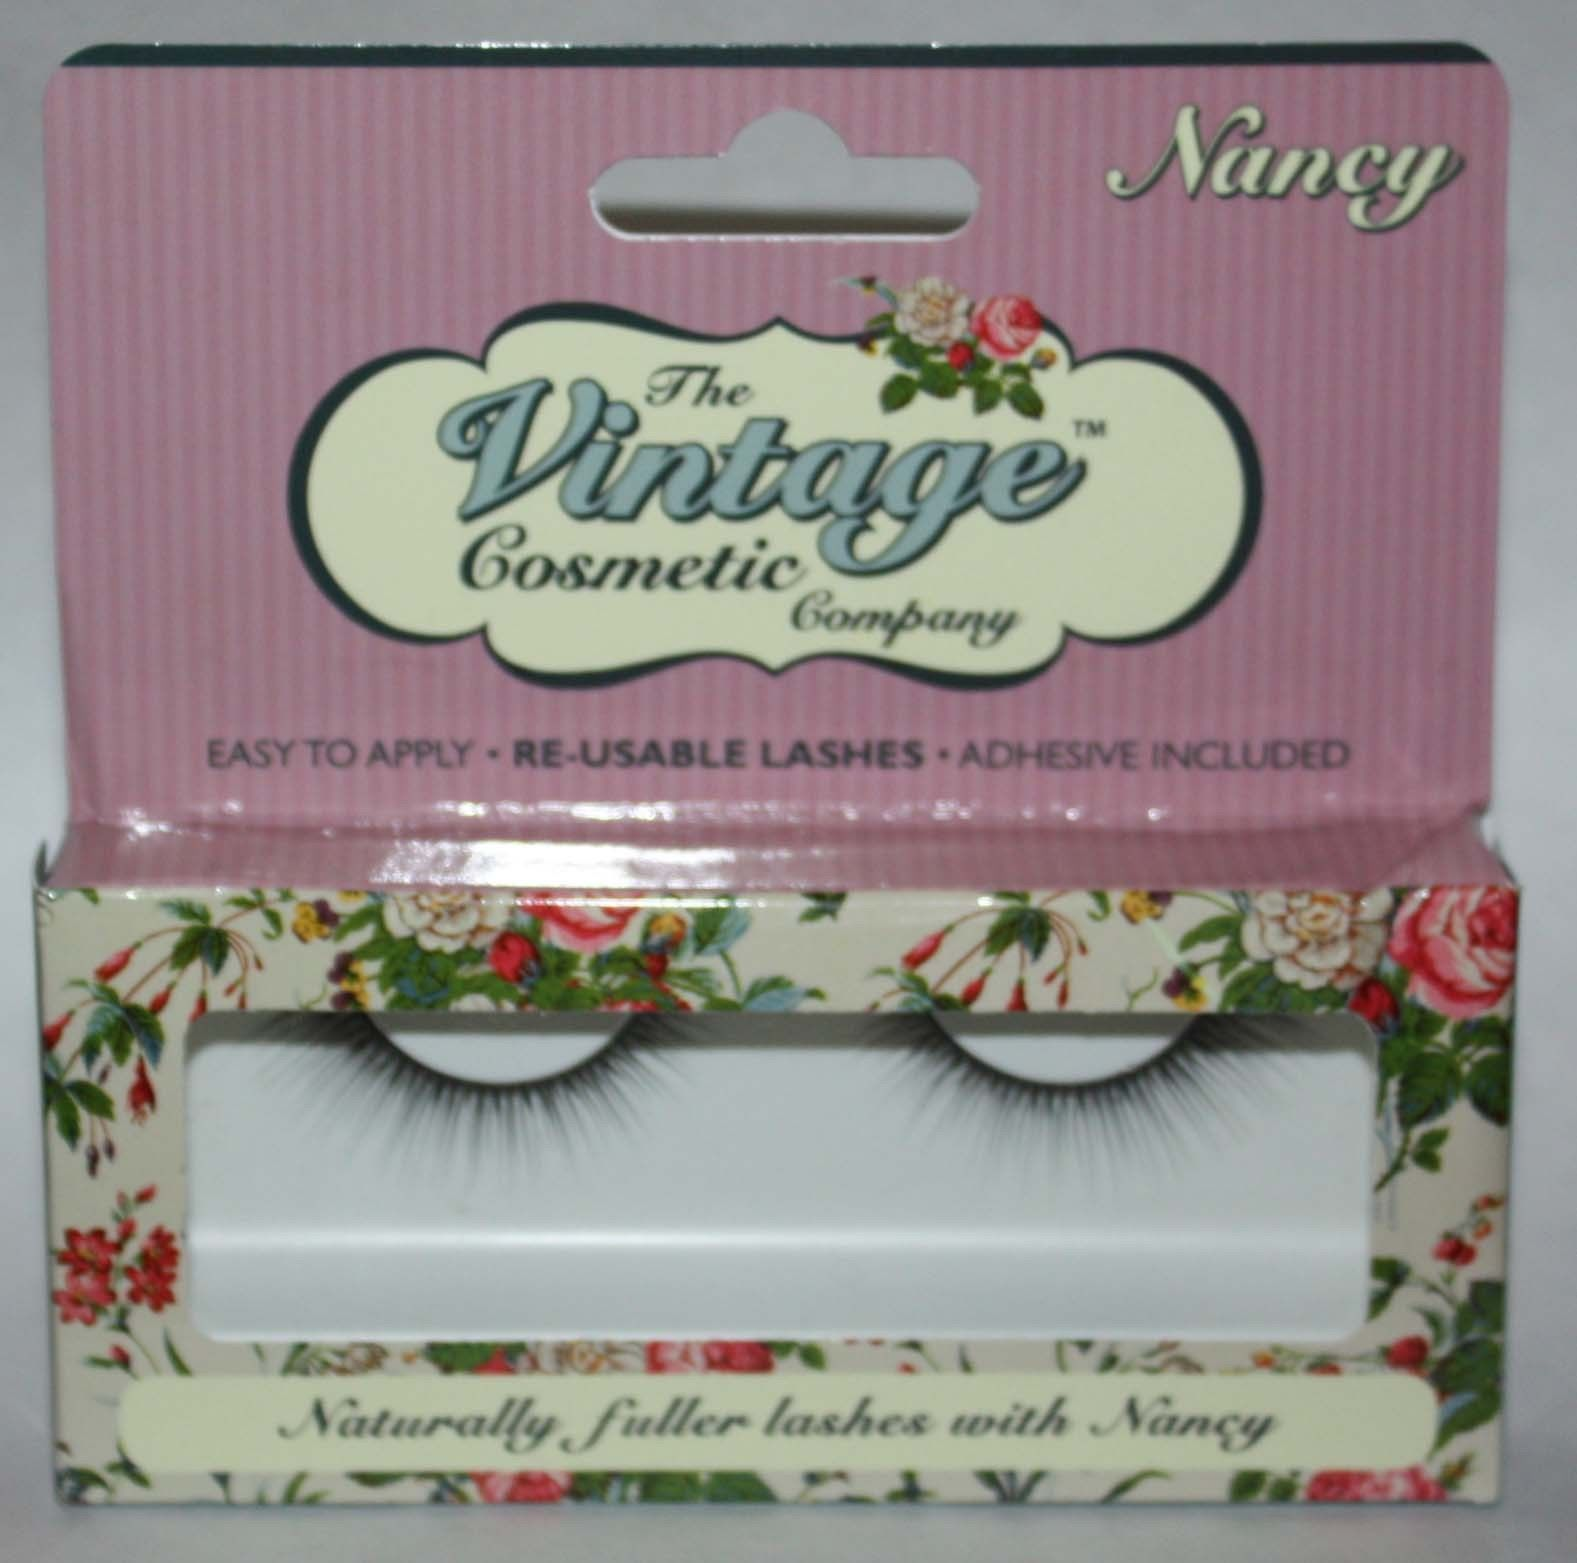 The Vintage Cosmetic Company NANCY Re-Usable False Eye Lashes 11200